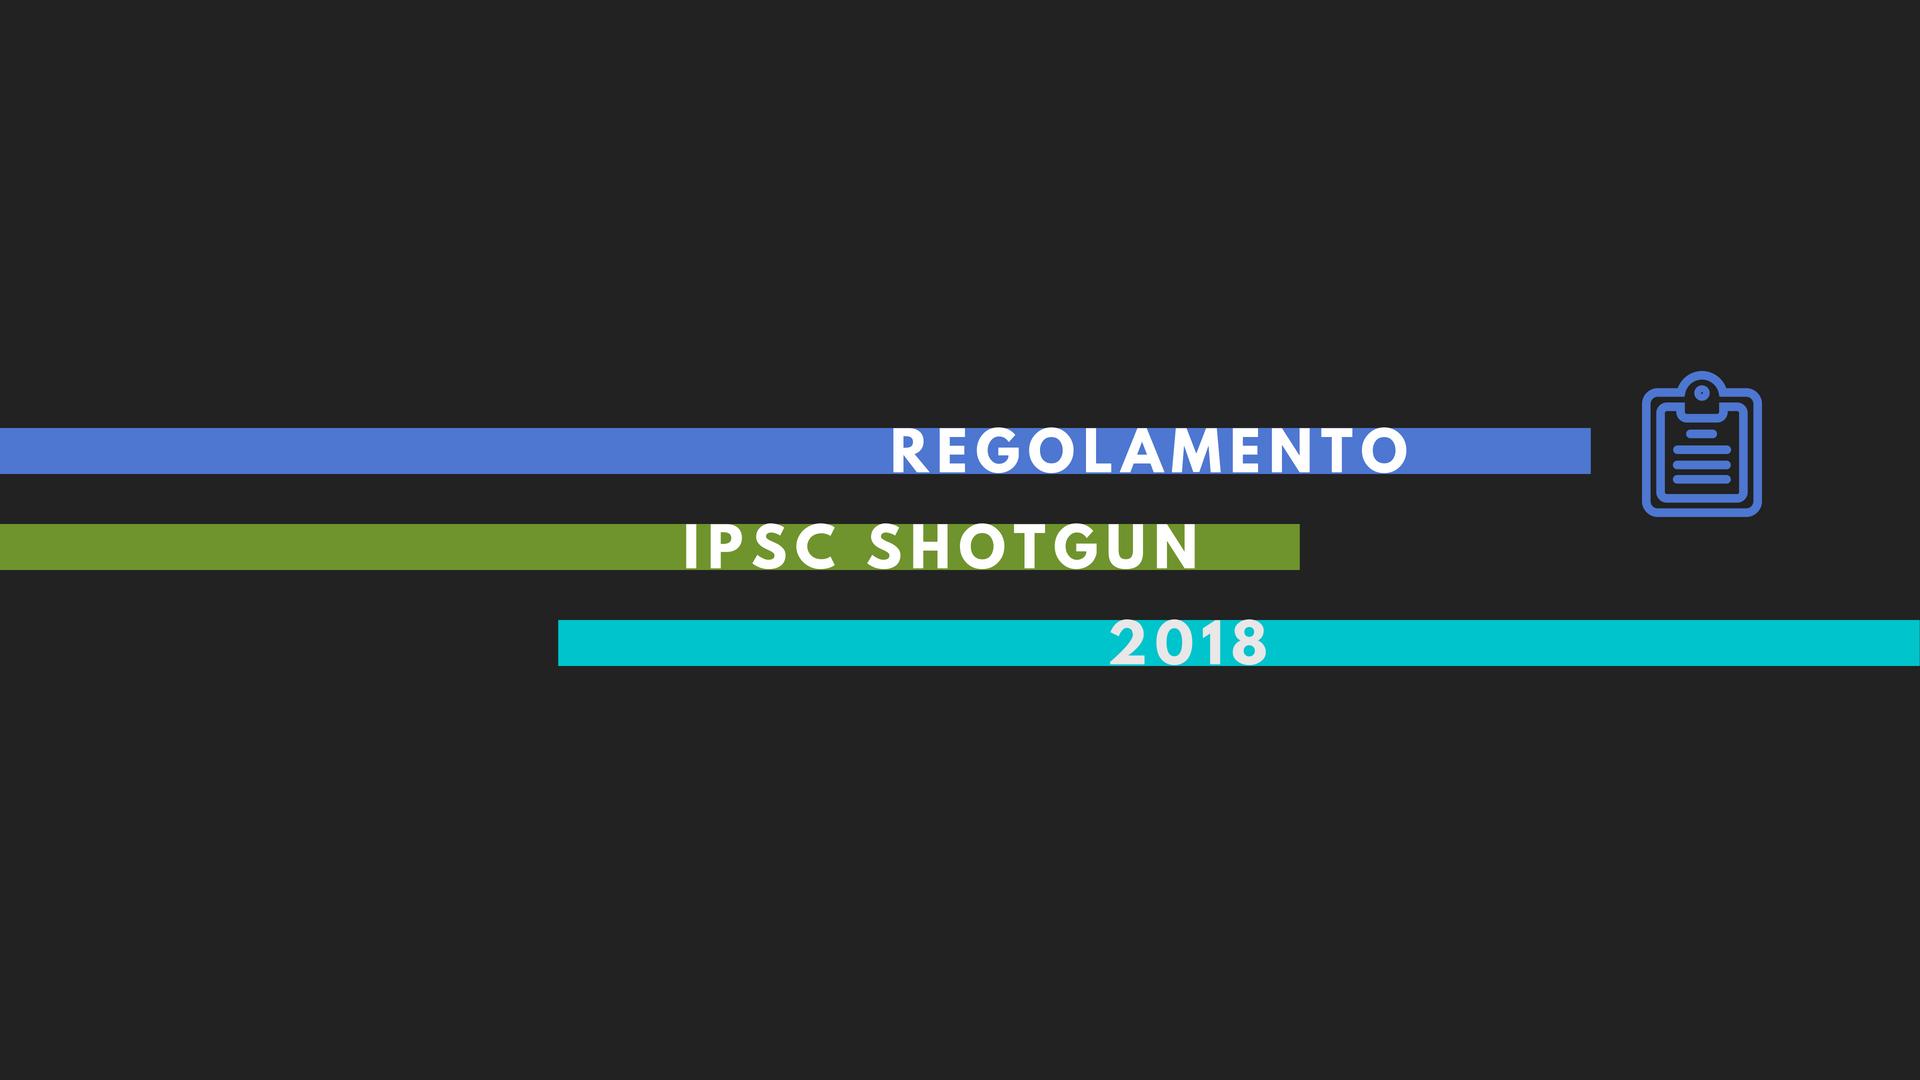 FITDS   Regolamento IPSC Shotgun 2018